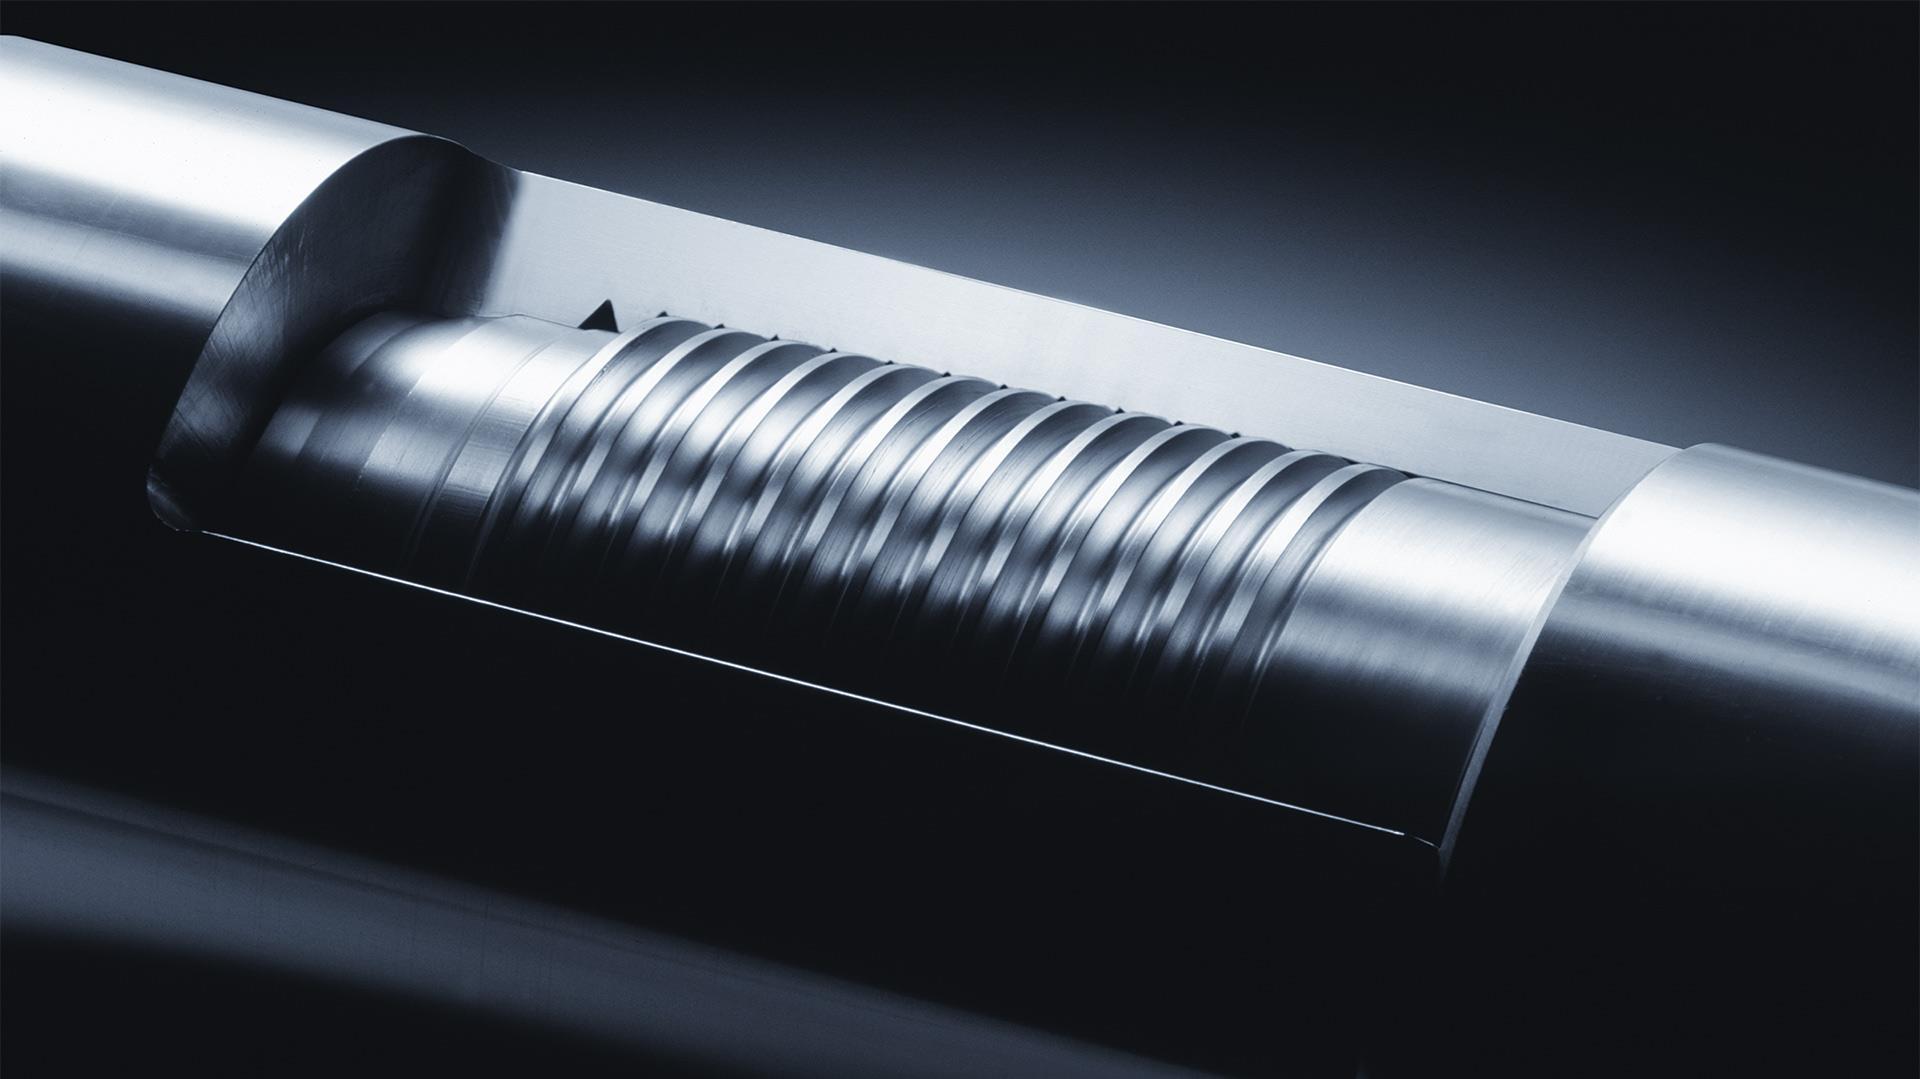 Closeup of a cutout showing XT-M Connection